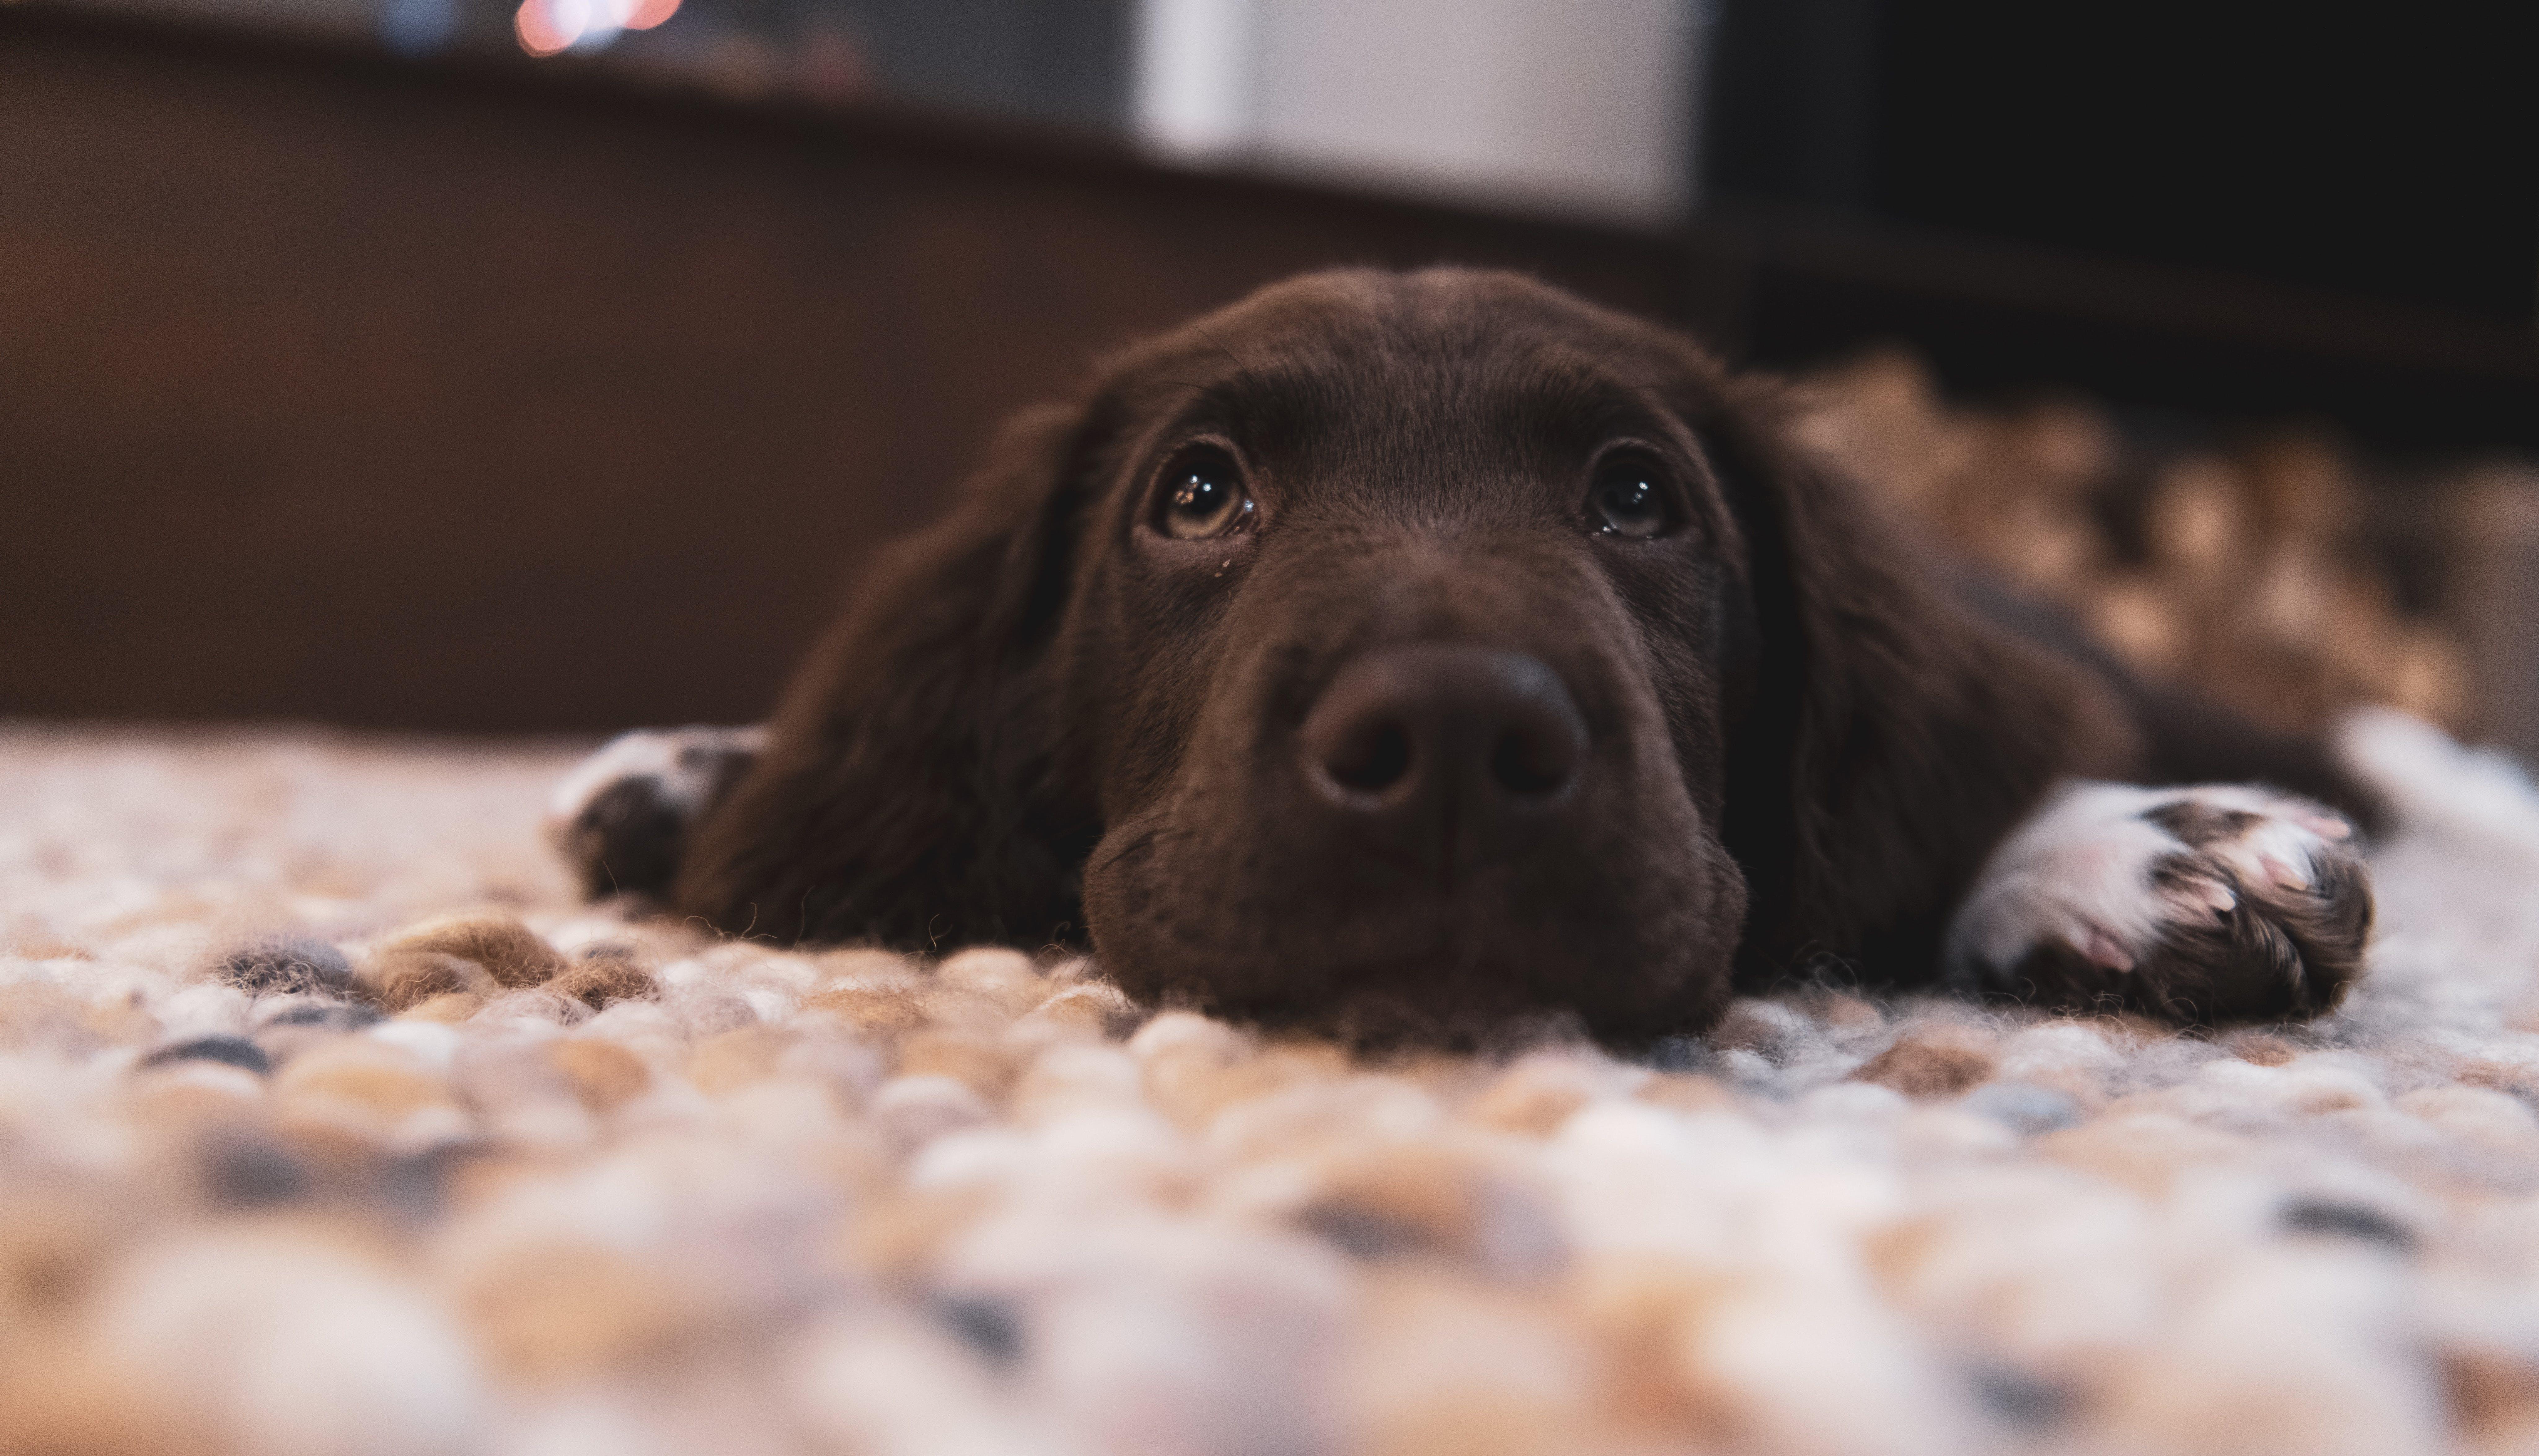 Chocolate Labrador Retriever Puppy on Floor